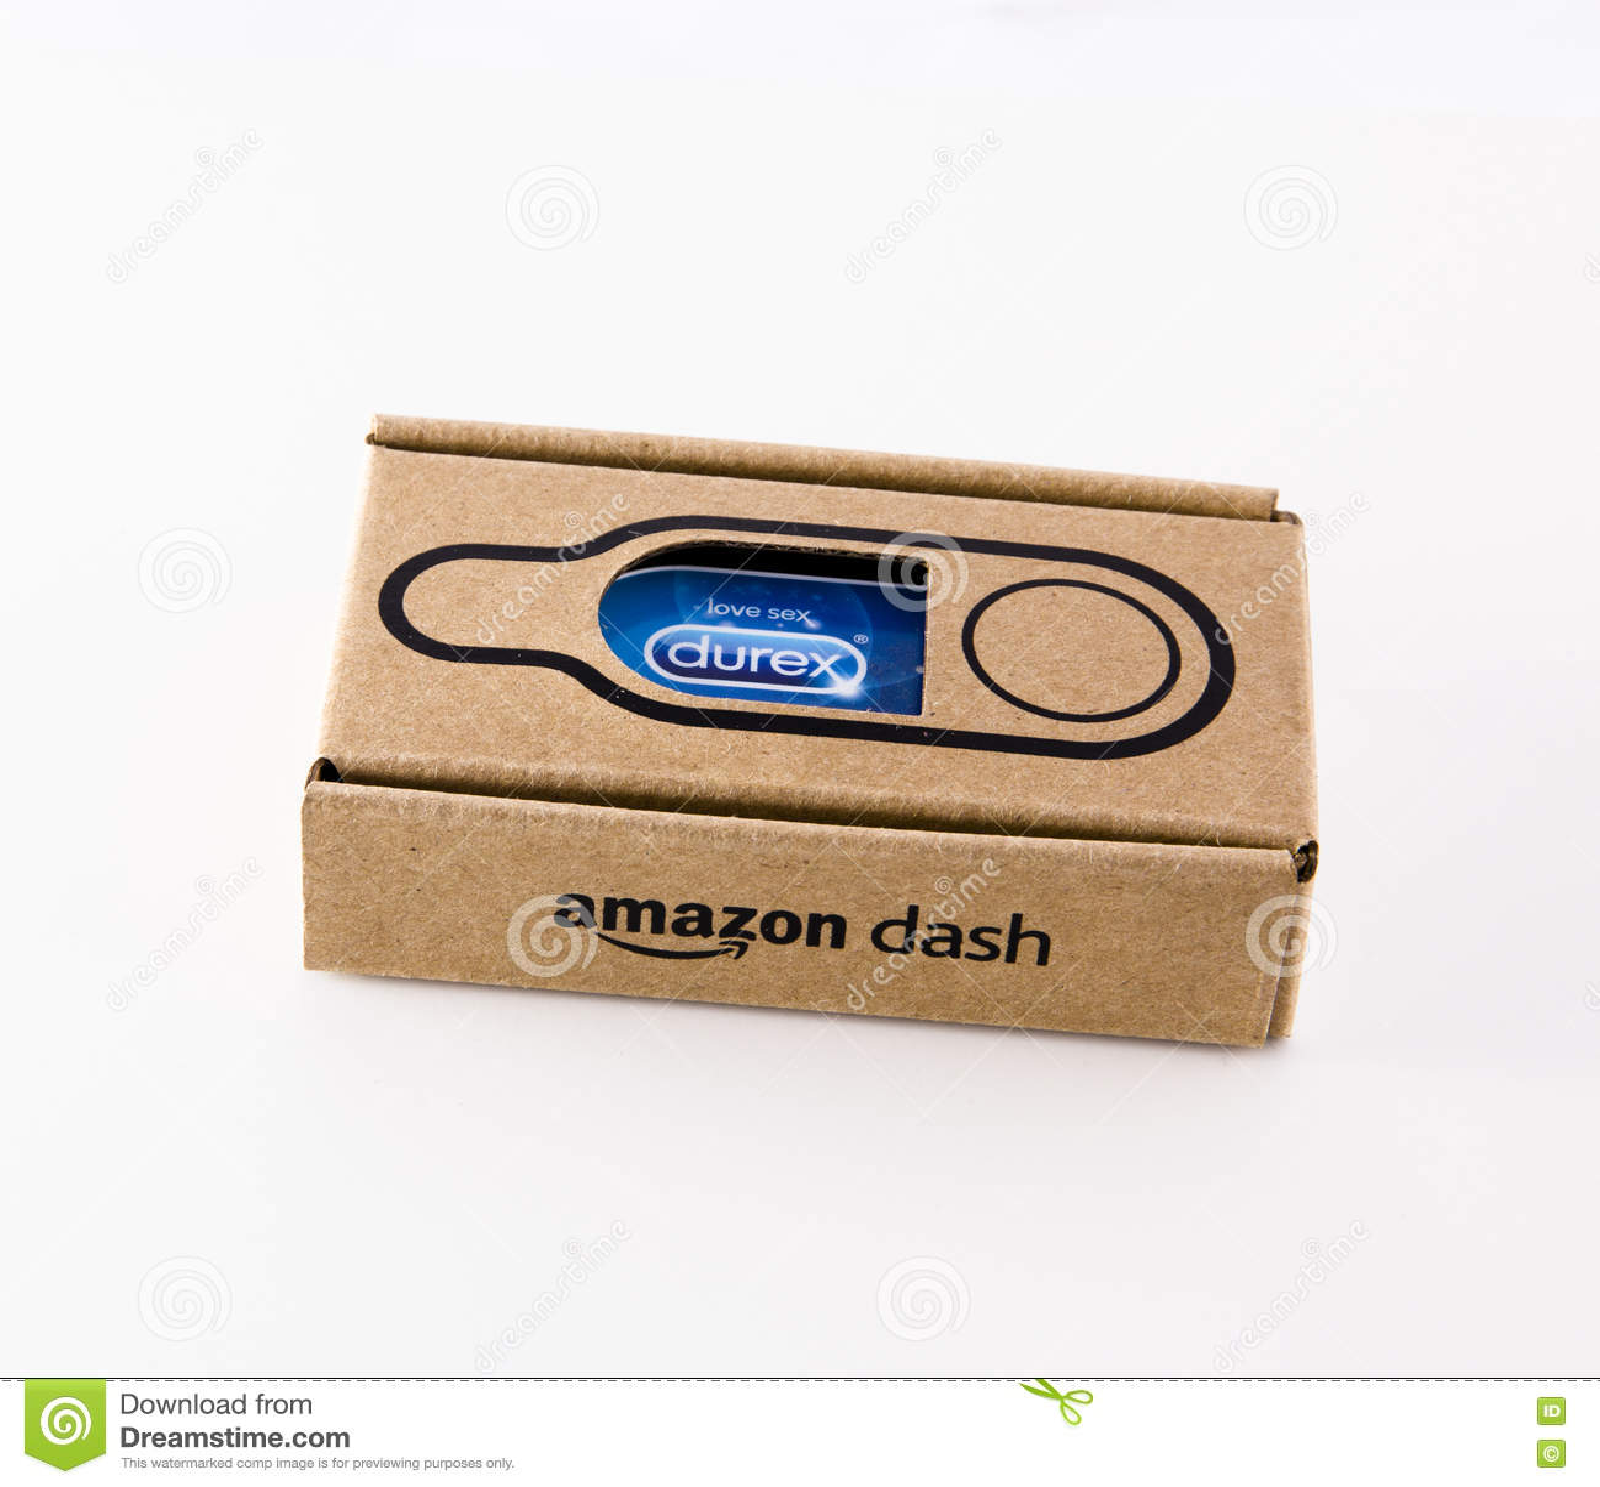 LEEDS, UK - 17 November 2016. Photograph of an Amazon Dash button for durex condoms.